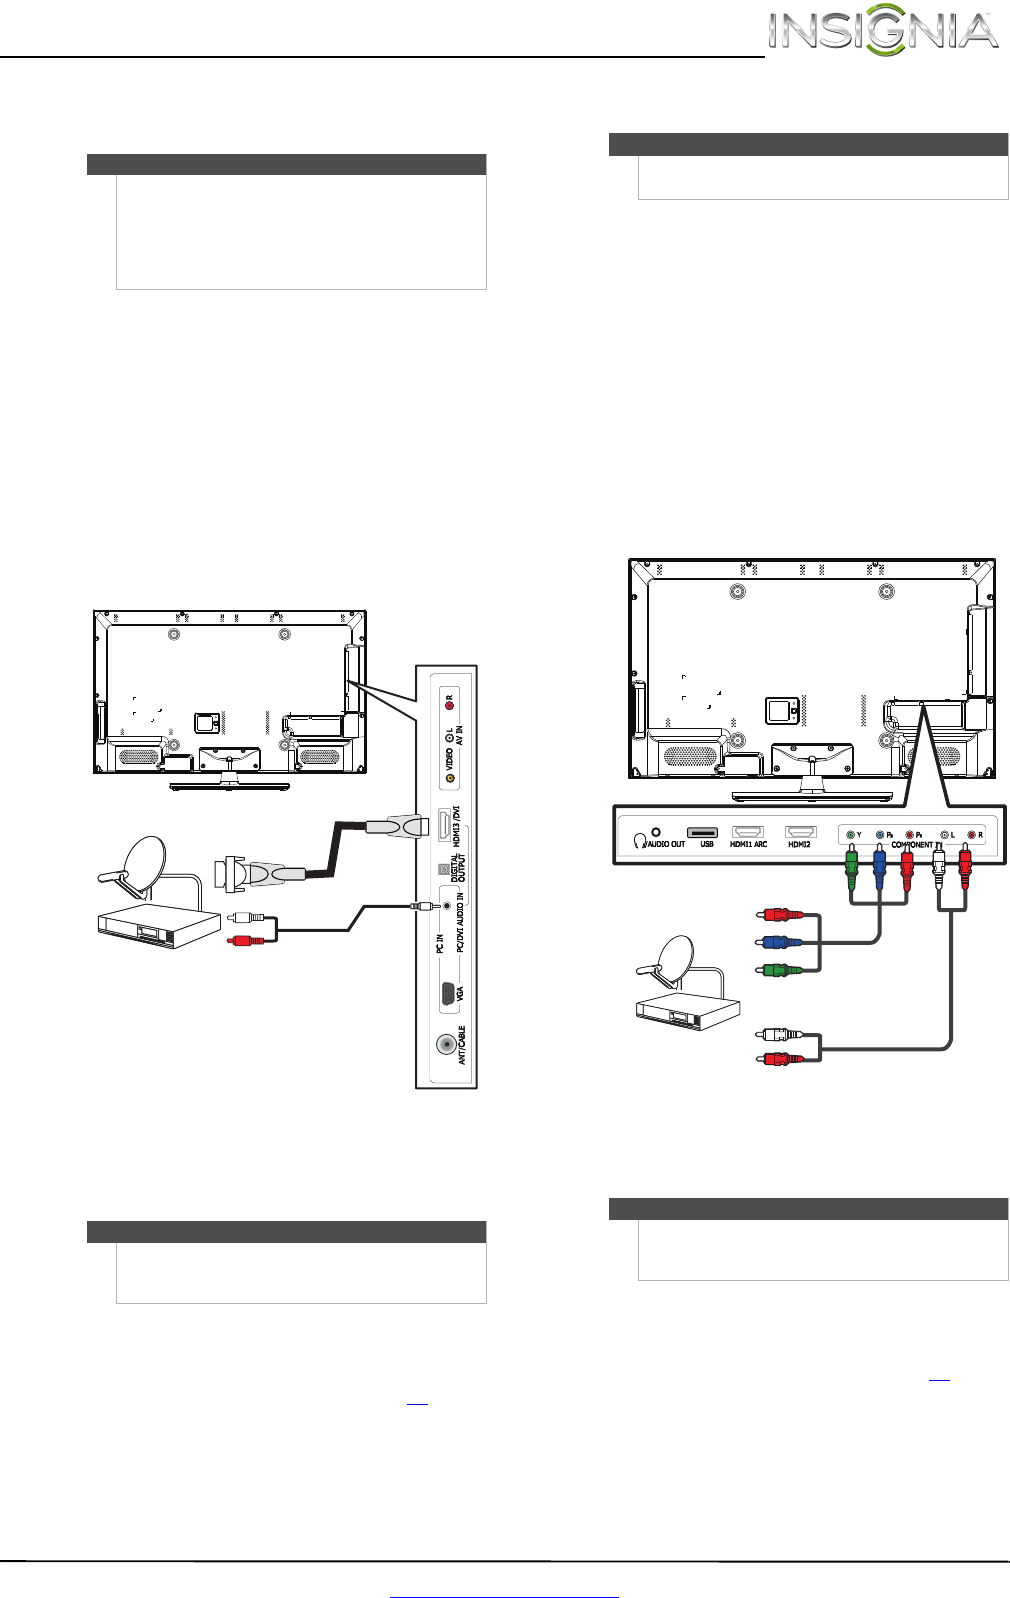 Insignia NS 46E481A13 User Manual To The 229ff6ef 2c17